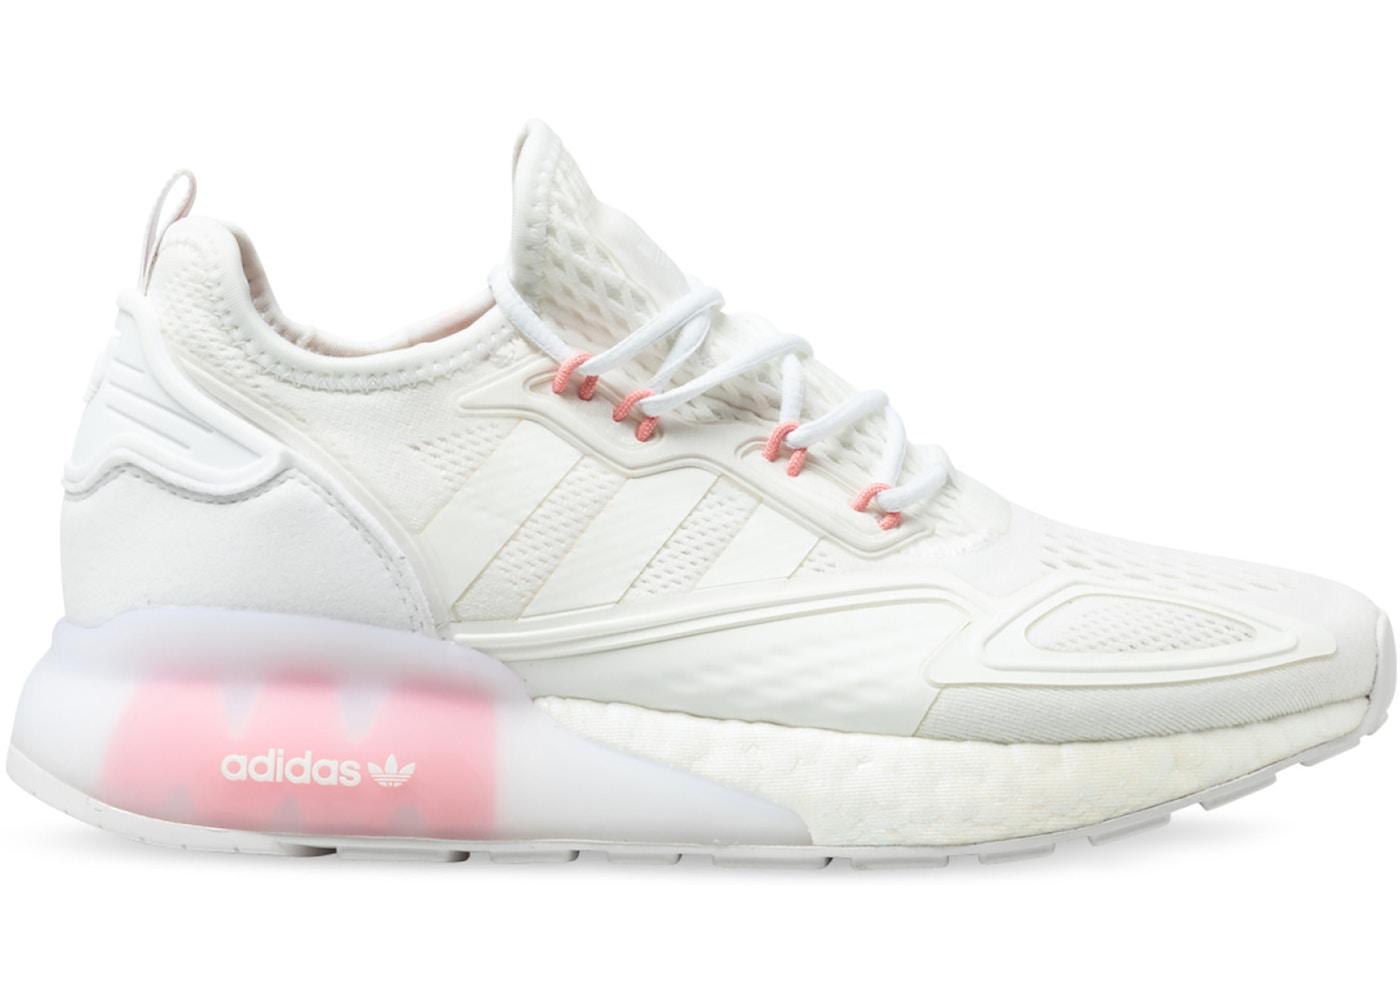 adidas 2k zx boost